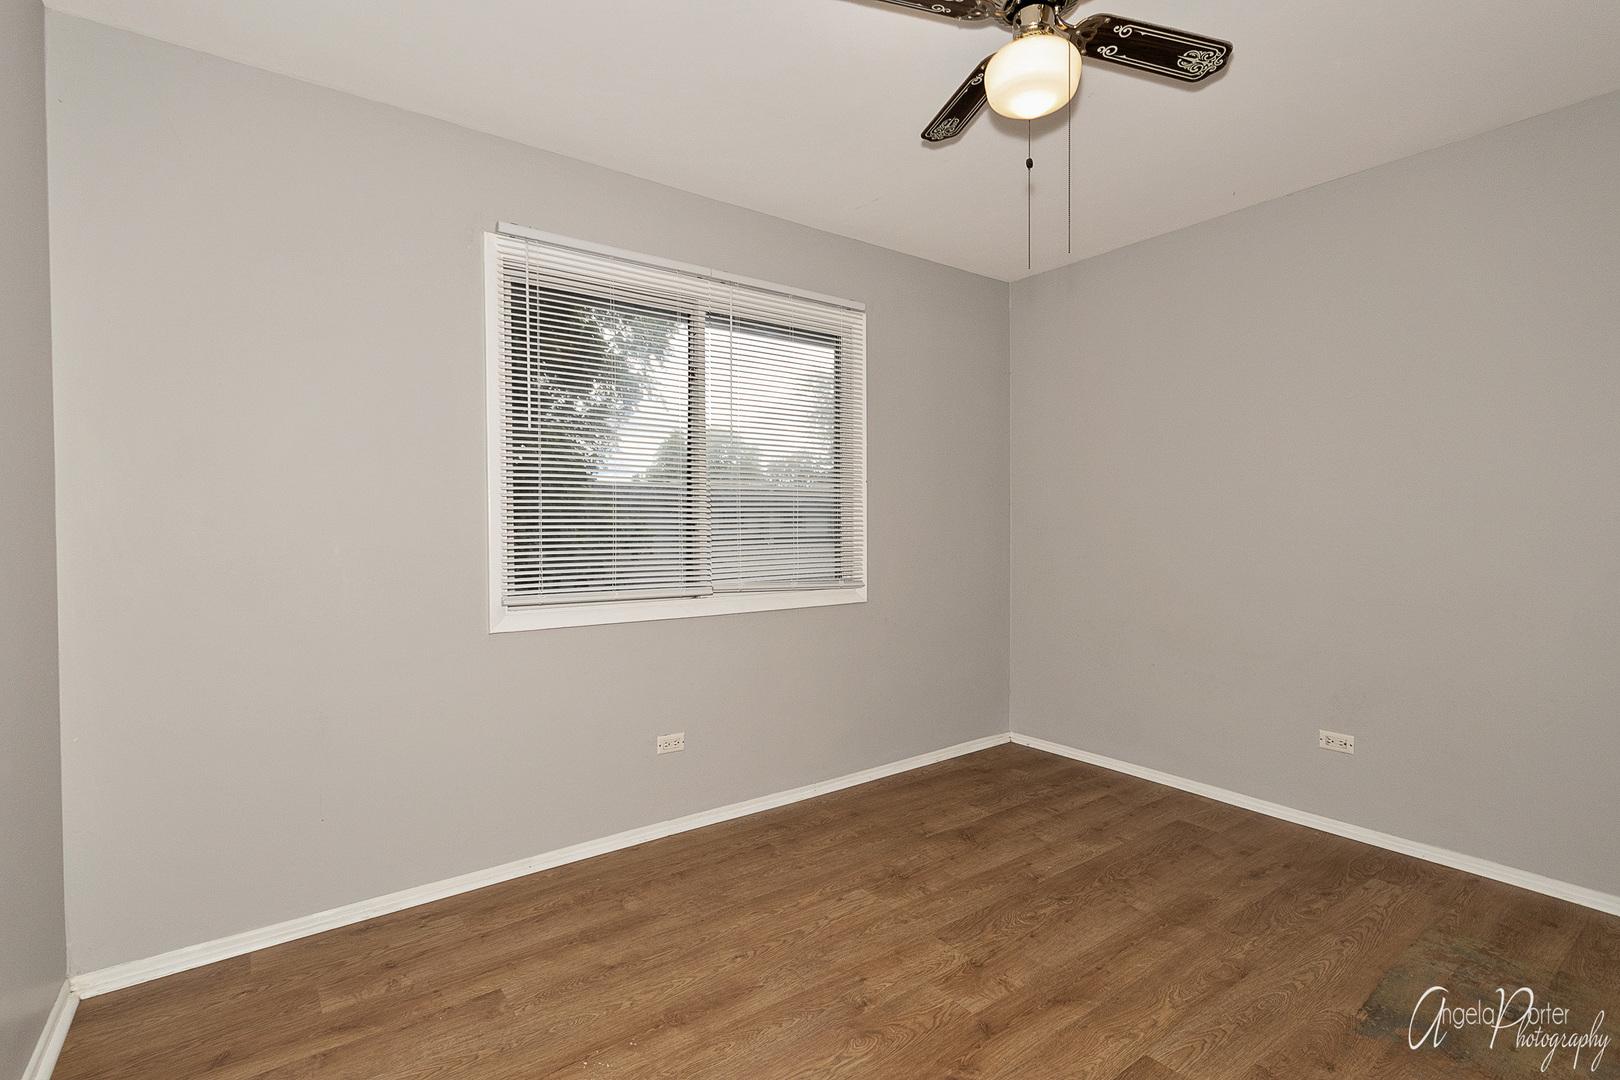 474 Ziegler 474, Grayslake, Illinois, 60030